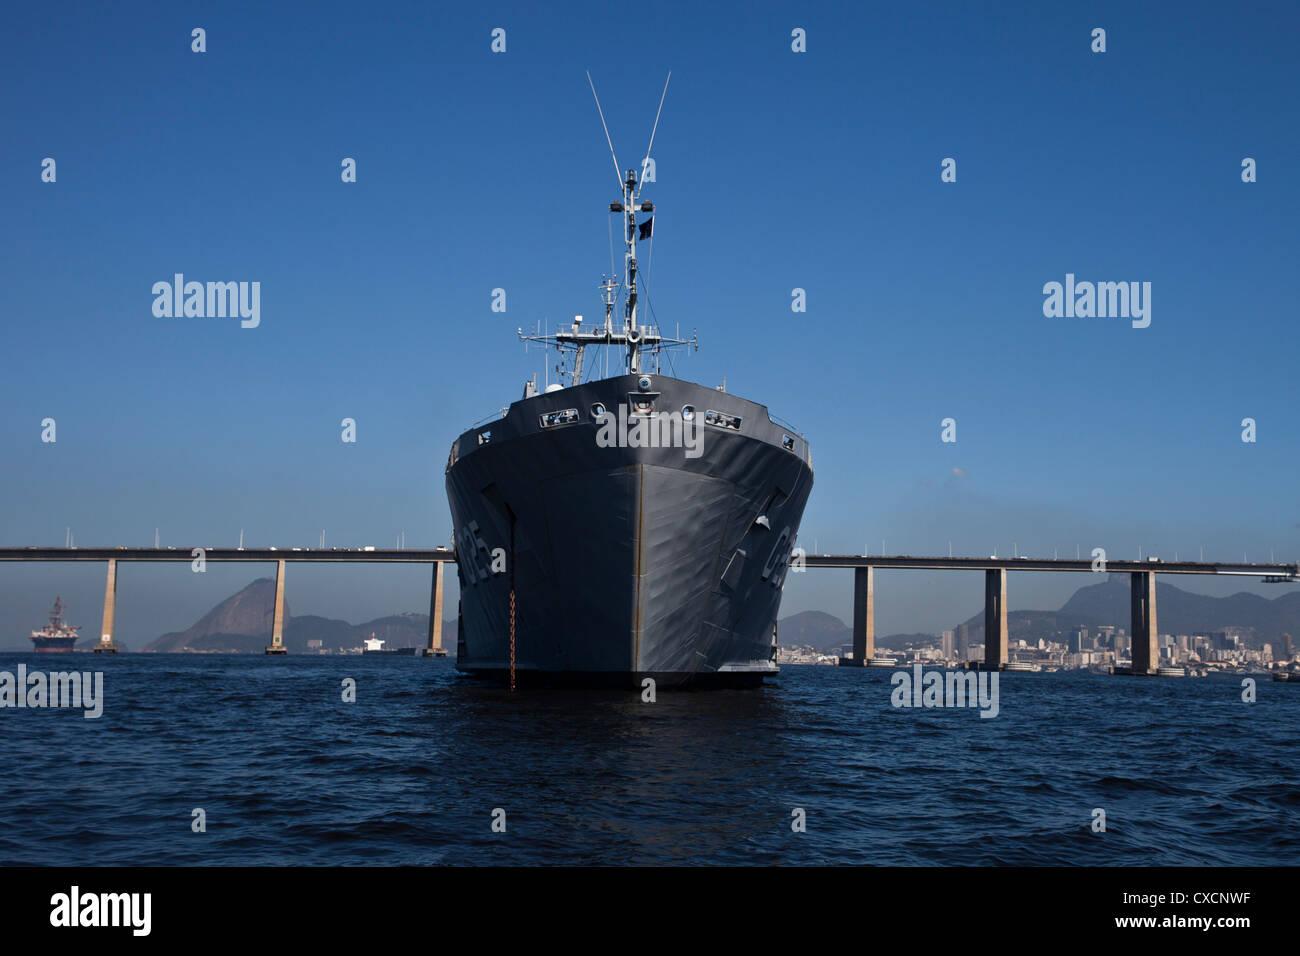 Brazil Navy ship anchored in Guanabara Bay. Rio-Niteroi bridge and Sugar Loaf, Rio de Janeiro, Brazil. - Stock Image